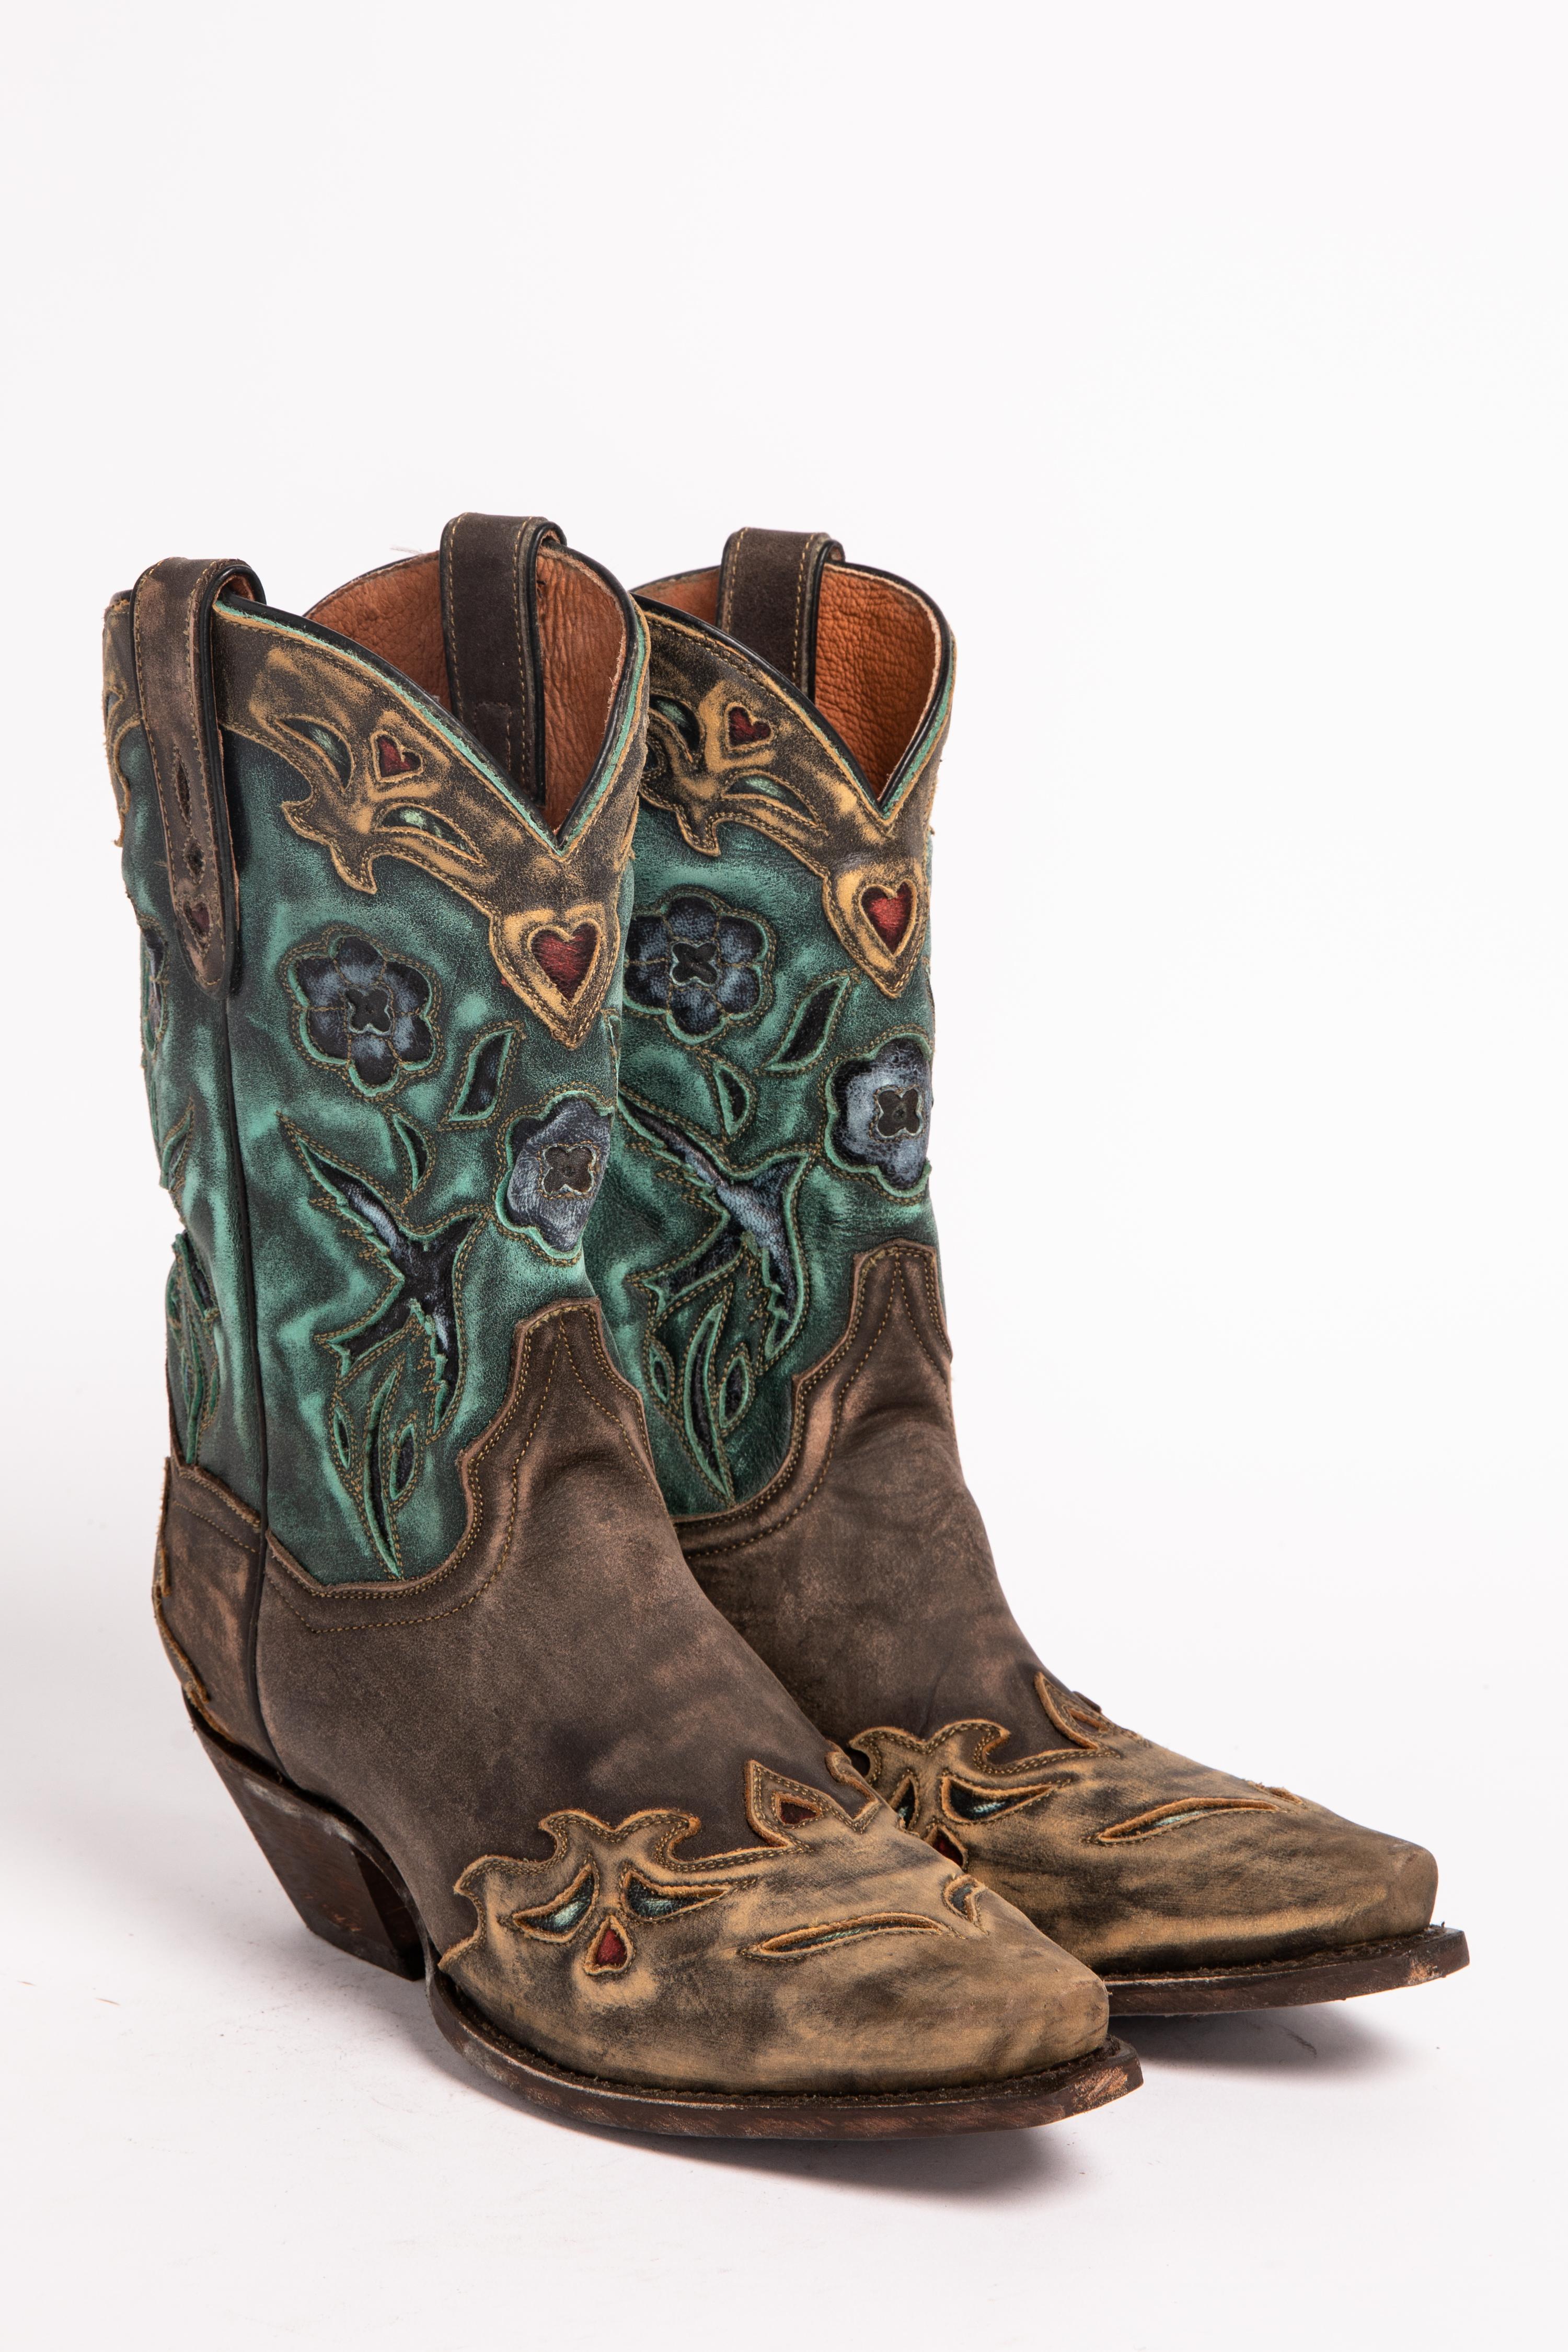 Dan Post Blue Bird Wingtip Cowgirl Boots - Snip Toe - Country ...